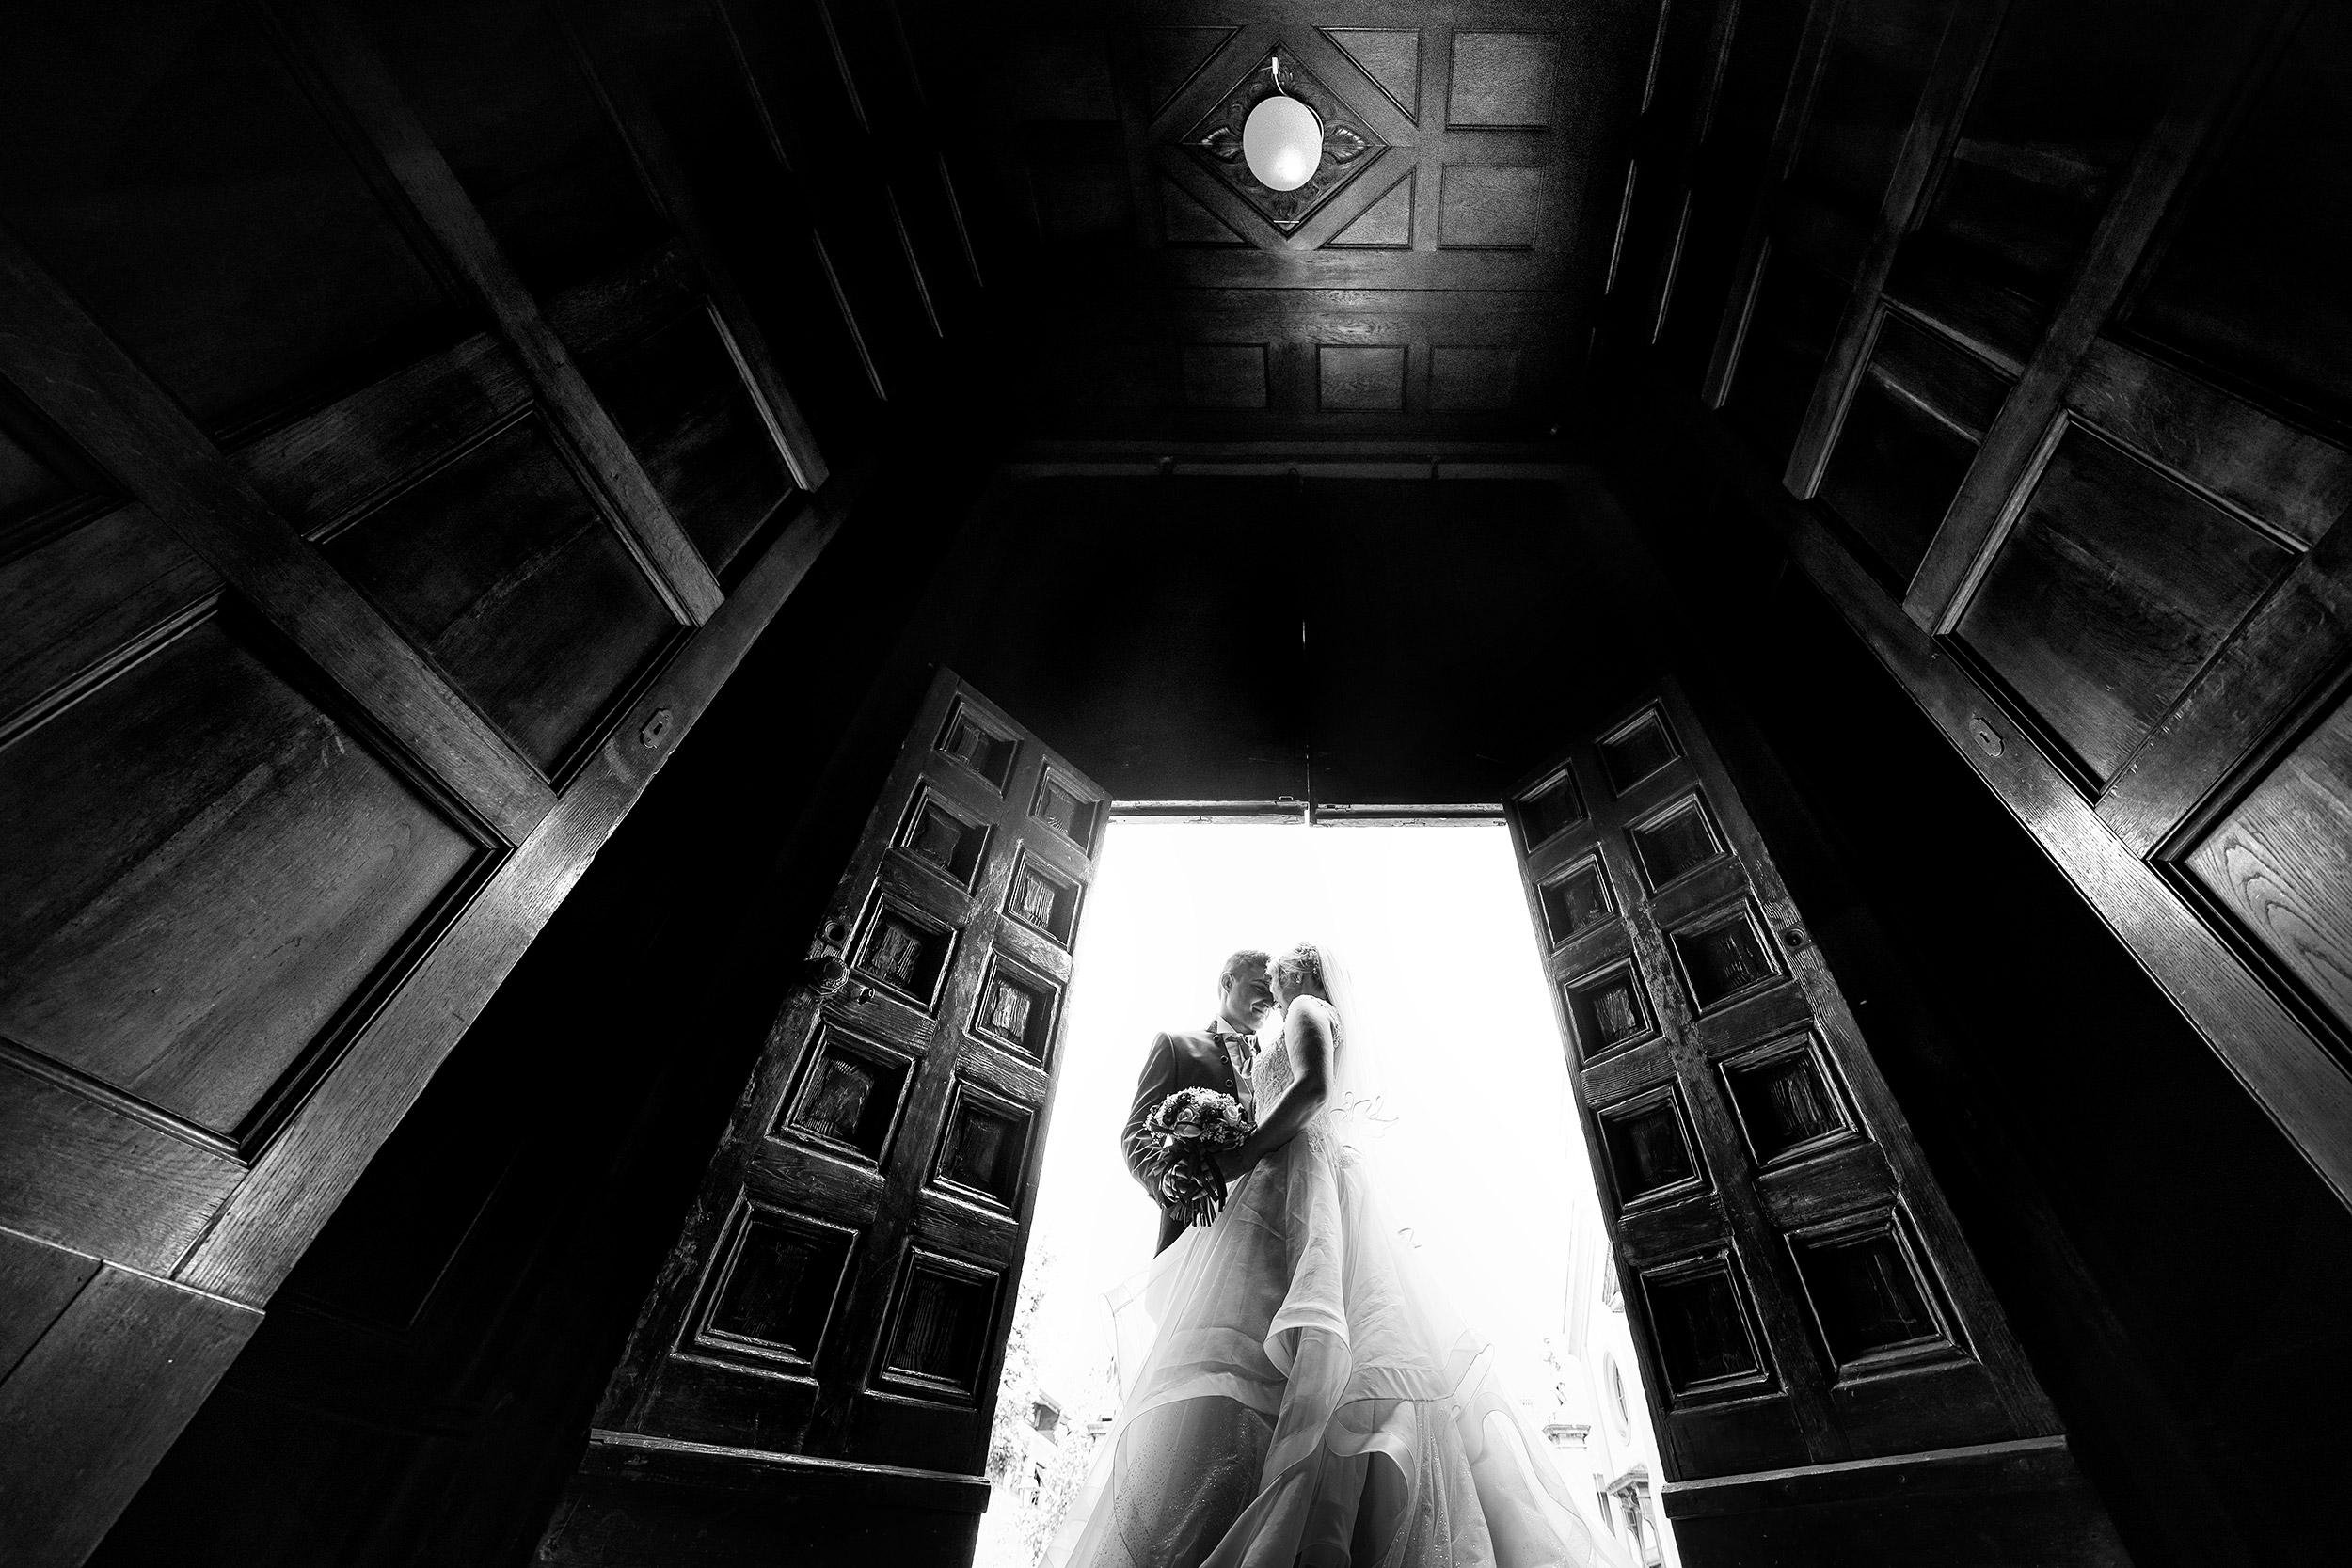 000 reportage uscita chiesa sposi foto matrimonio bergamo bianco nero 1